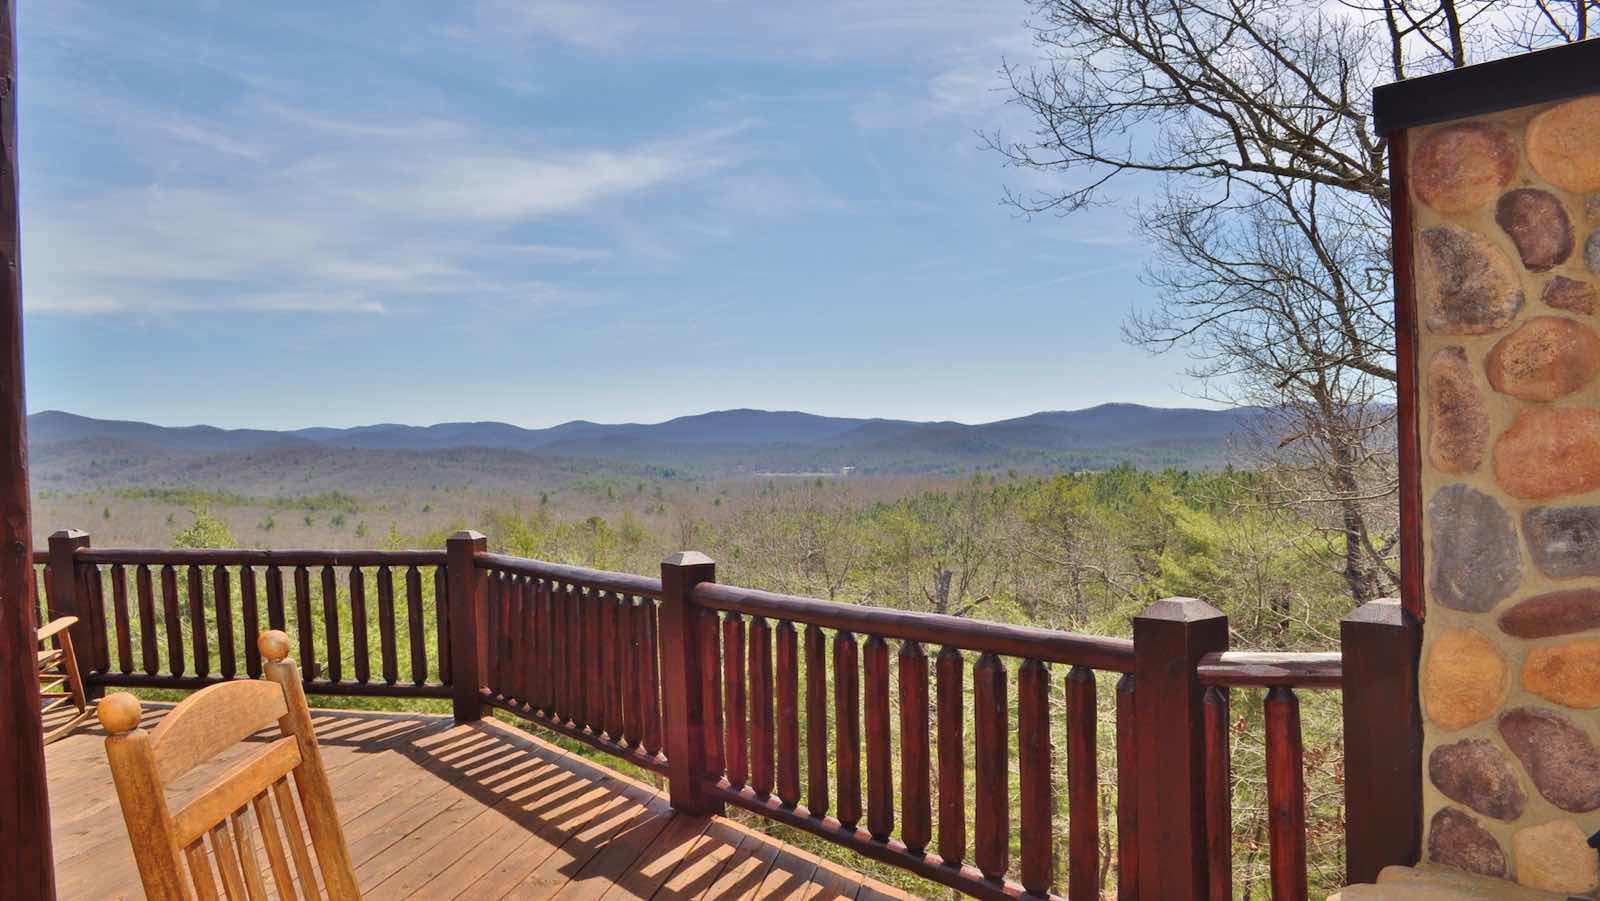 Pinecrest Rental Cabin Blue Ridge Ga